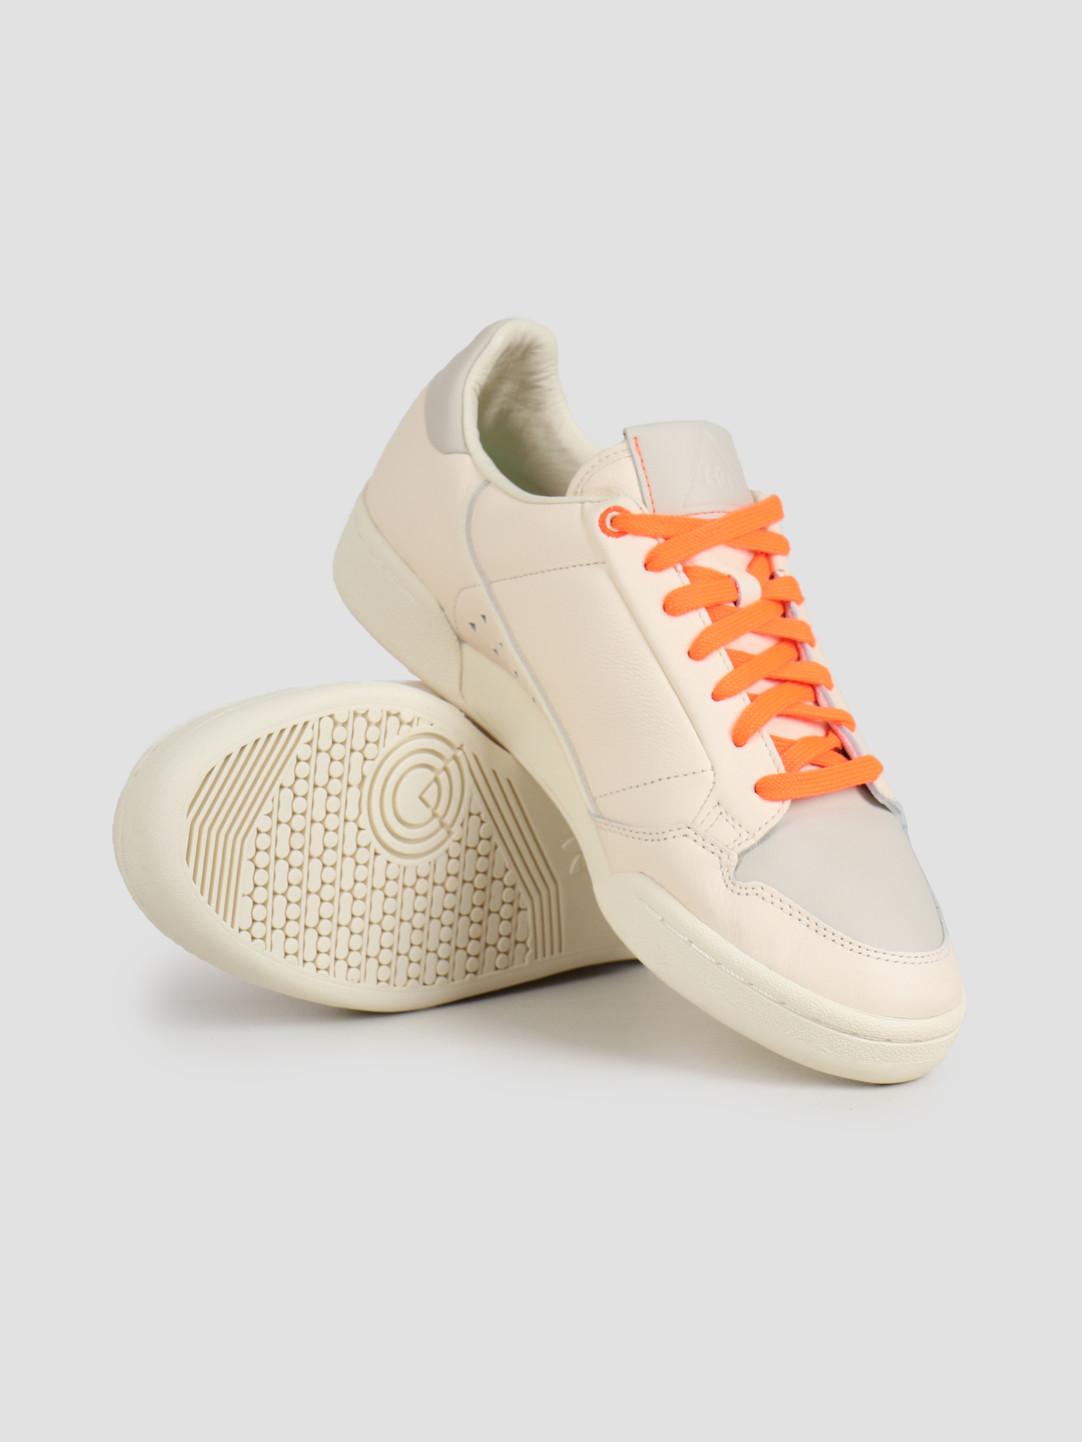 adidas adidas Pw Continental 80 Ecru Tint Core White Core Brown FX8002